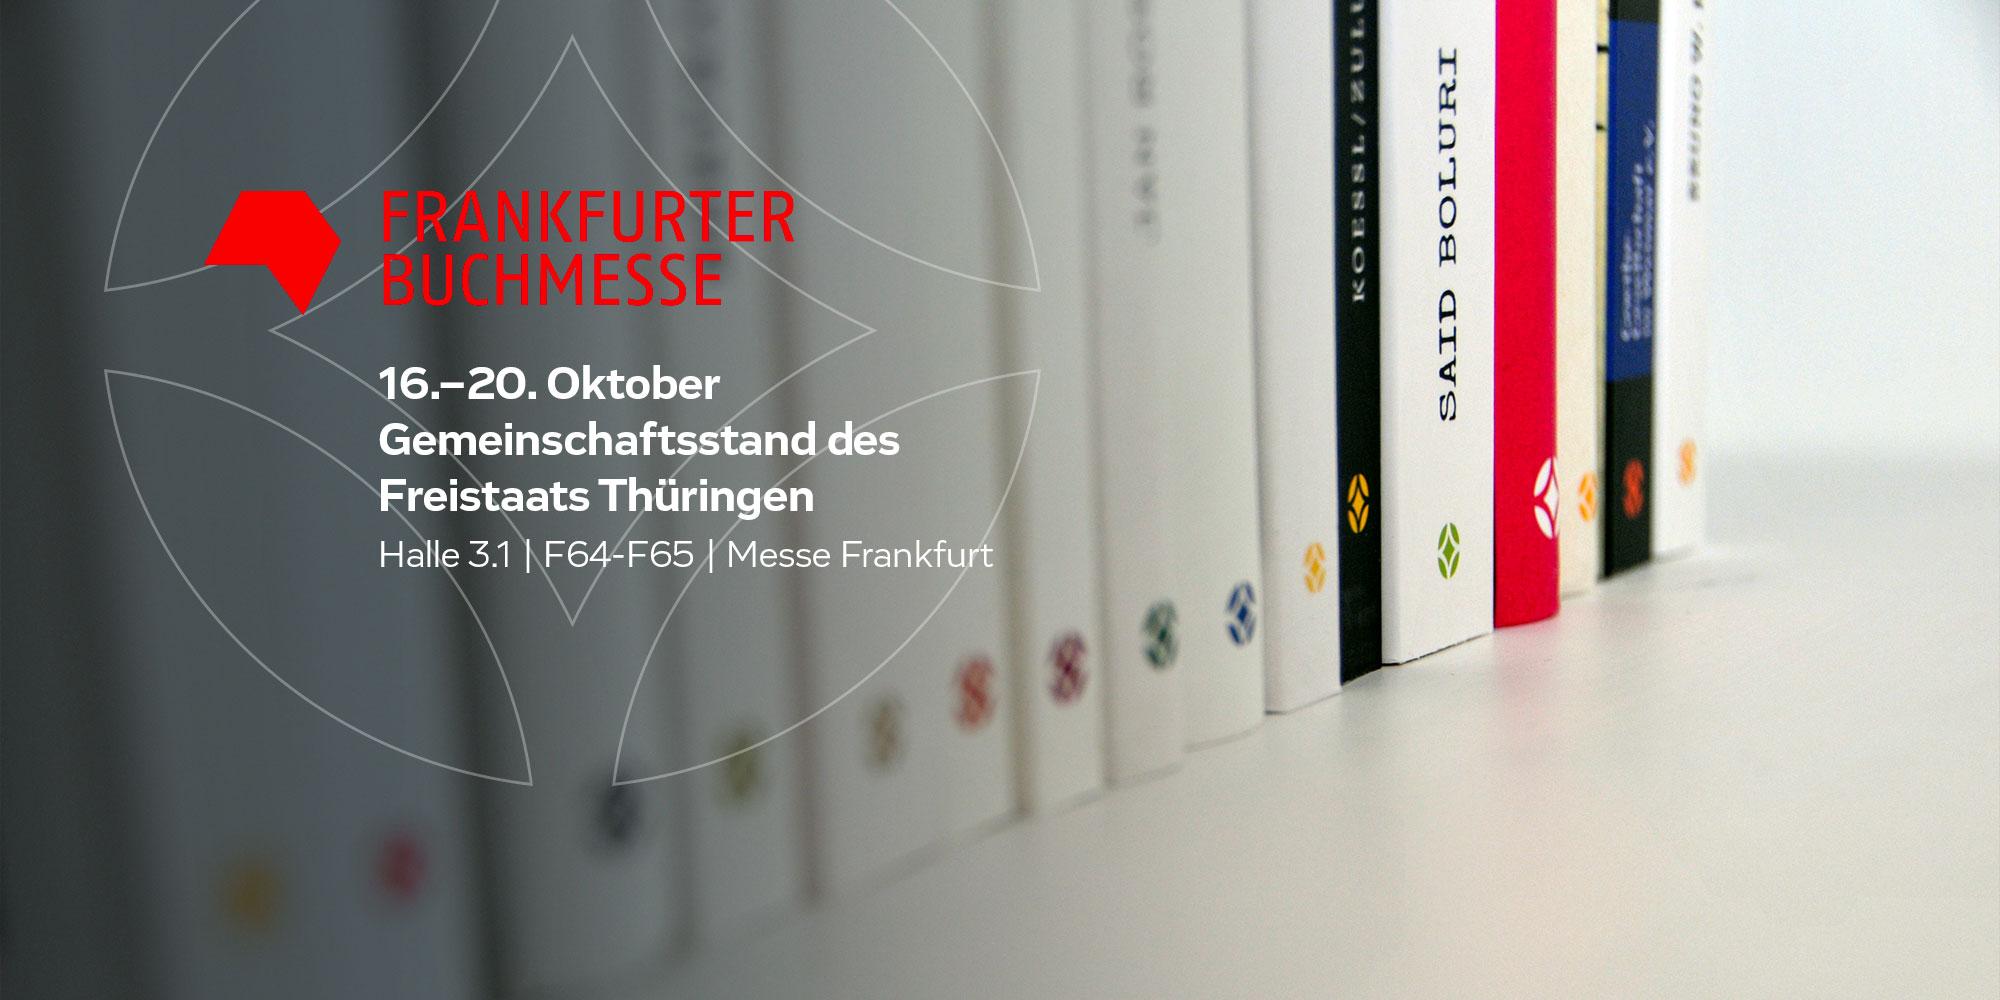 Grafik Terminankündigung Frankfurter Buchmesse